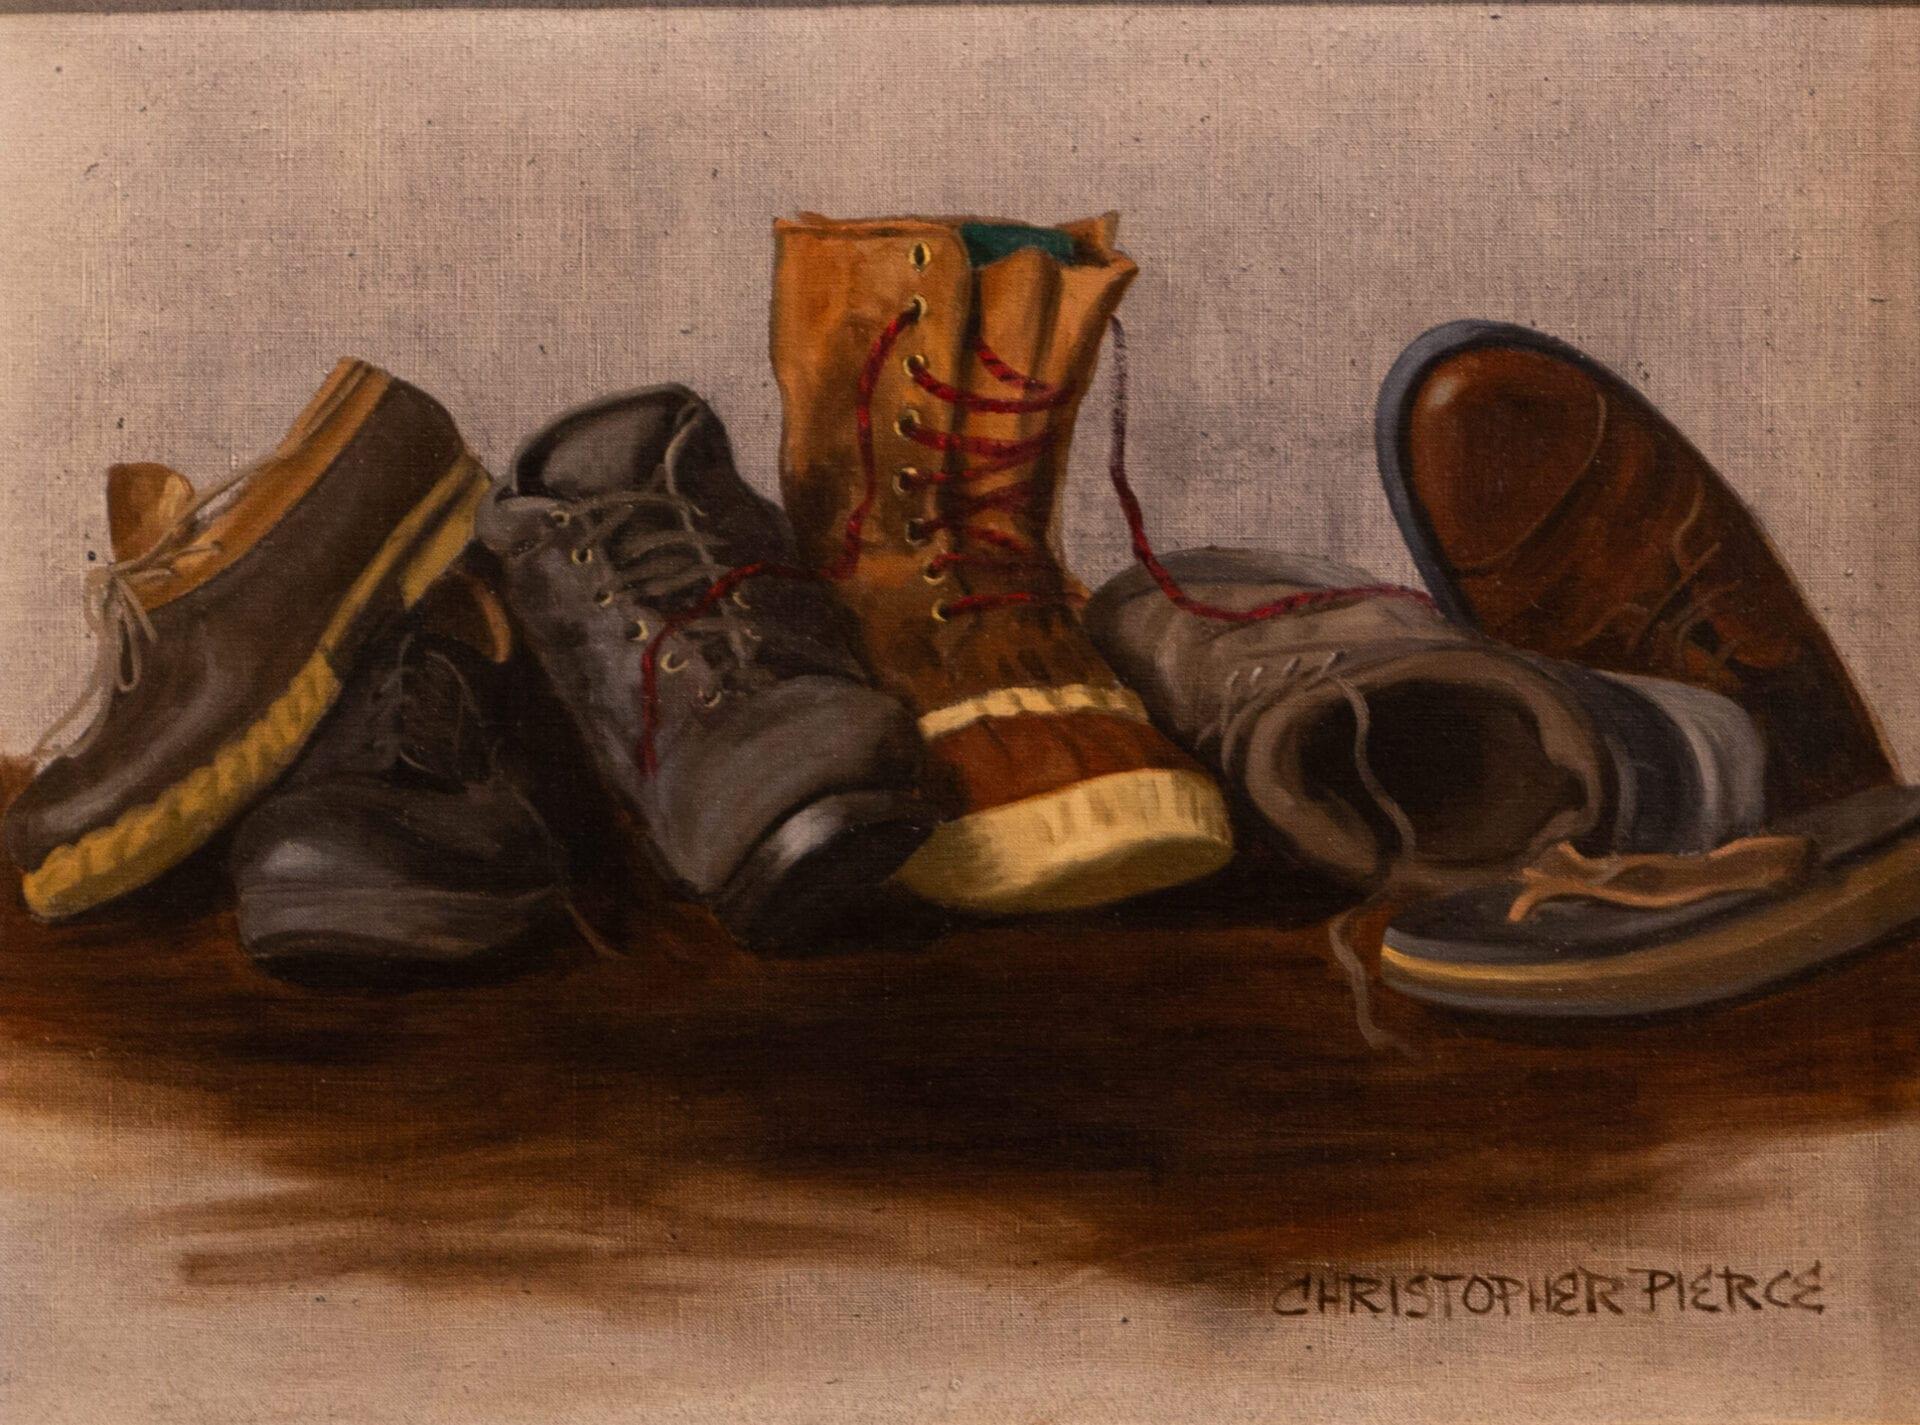 Christopher Pierce - My Left Feet